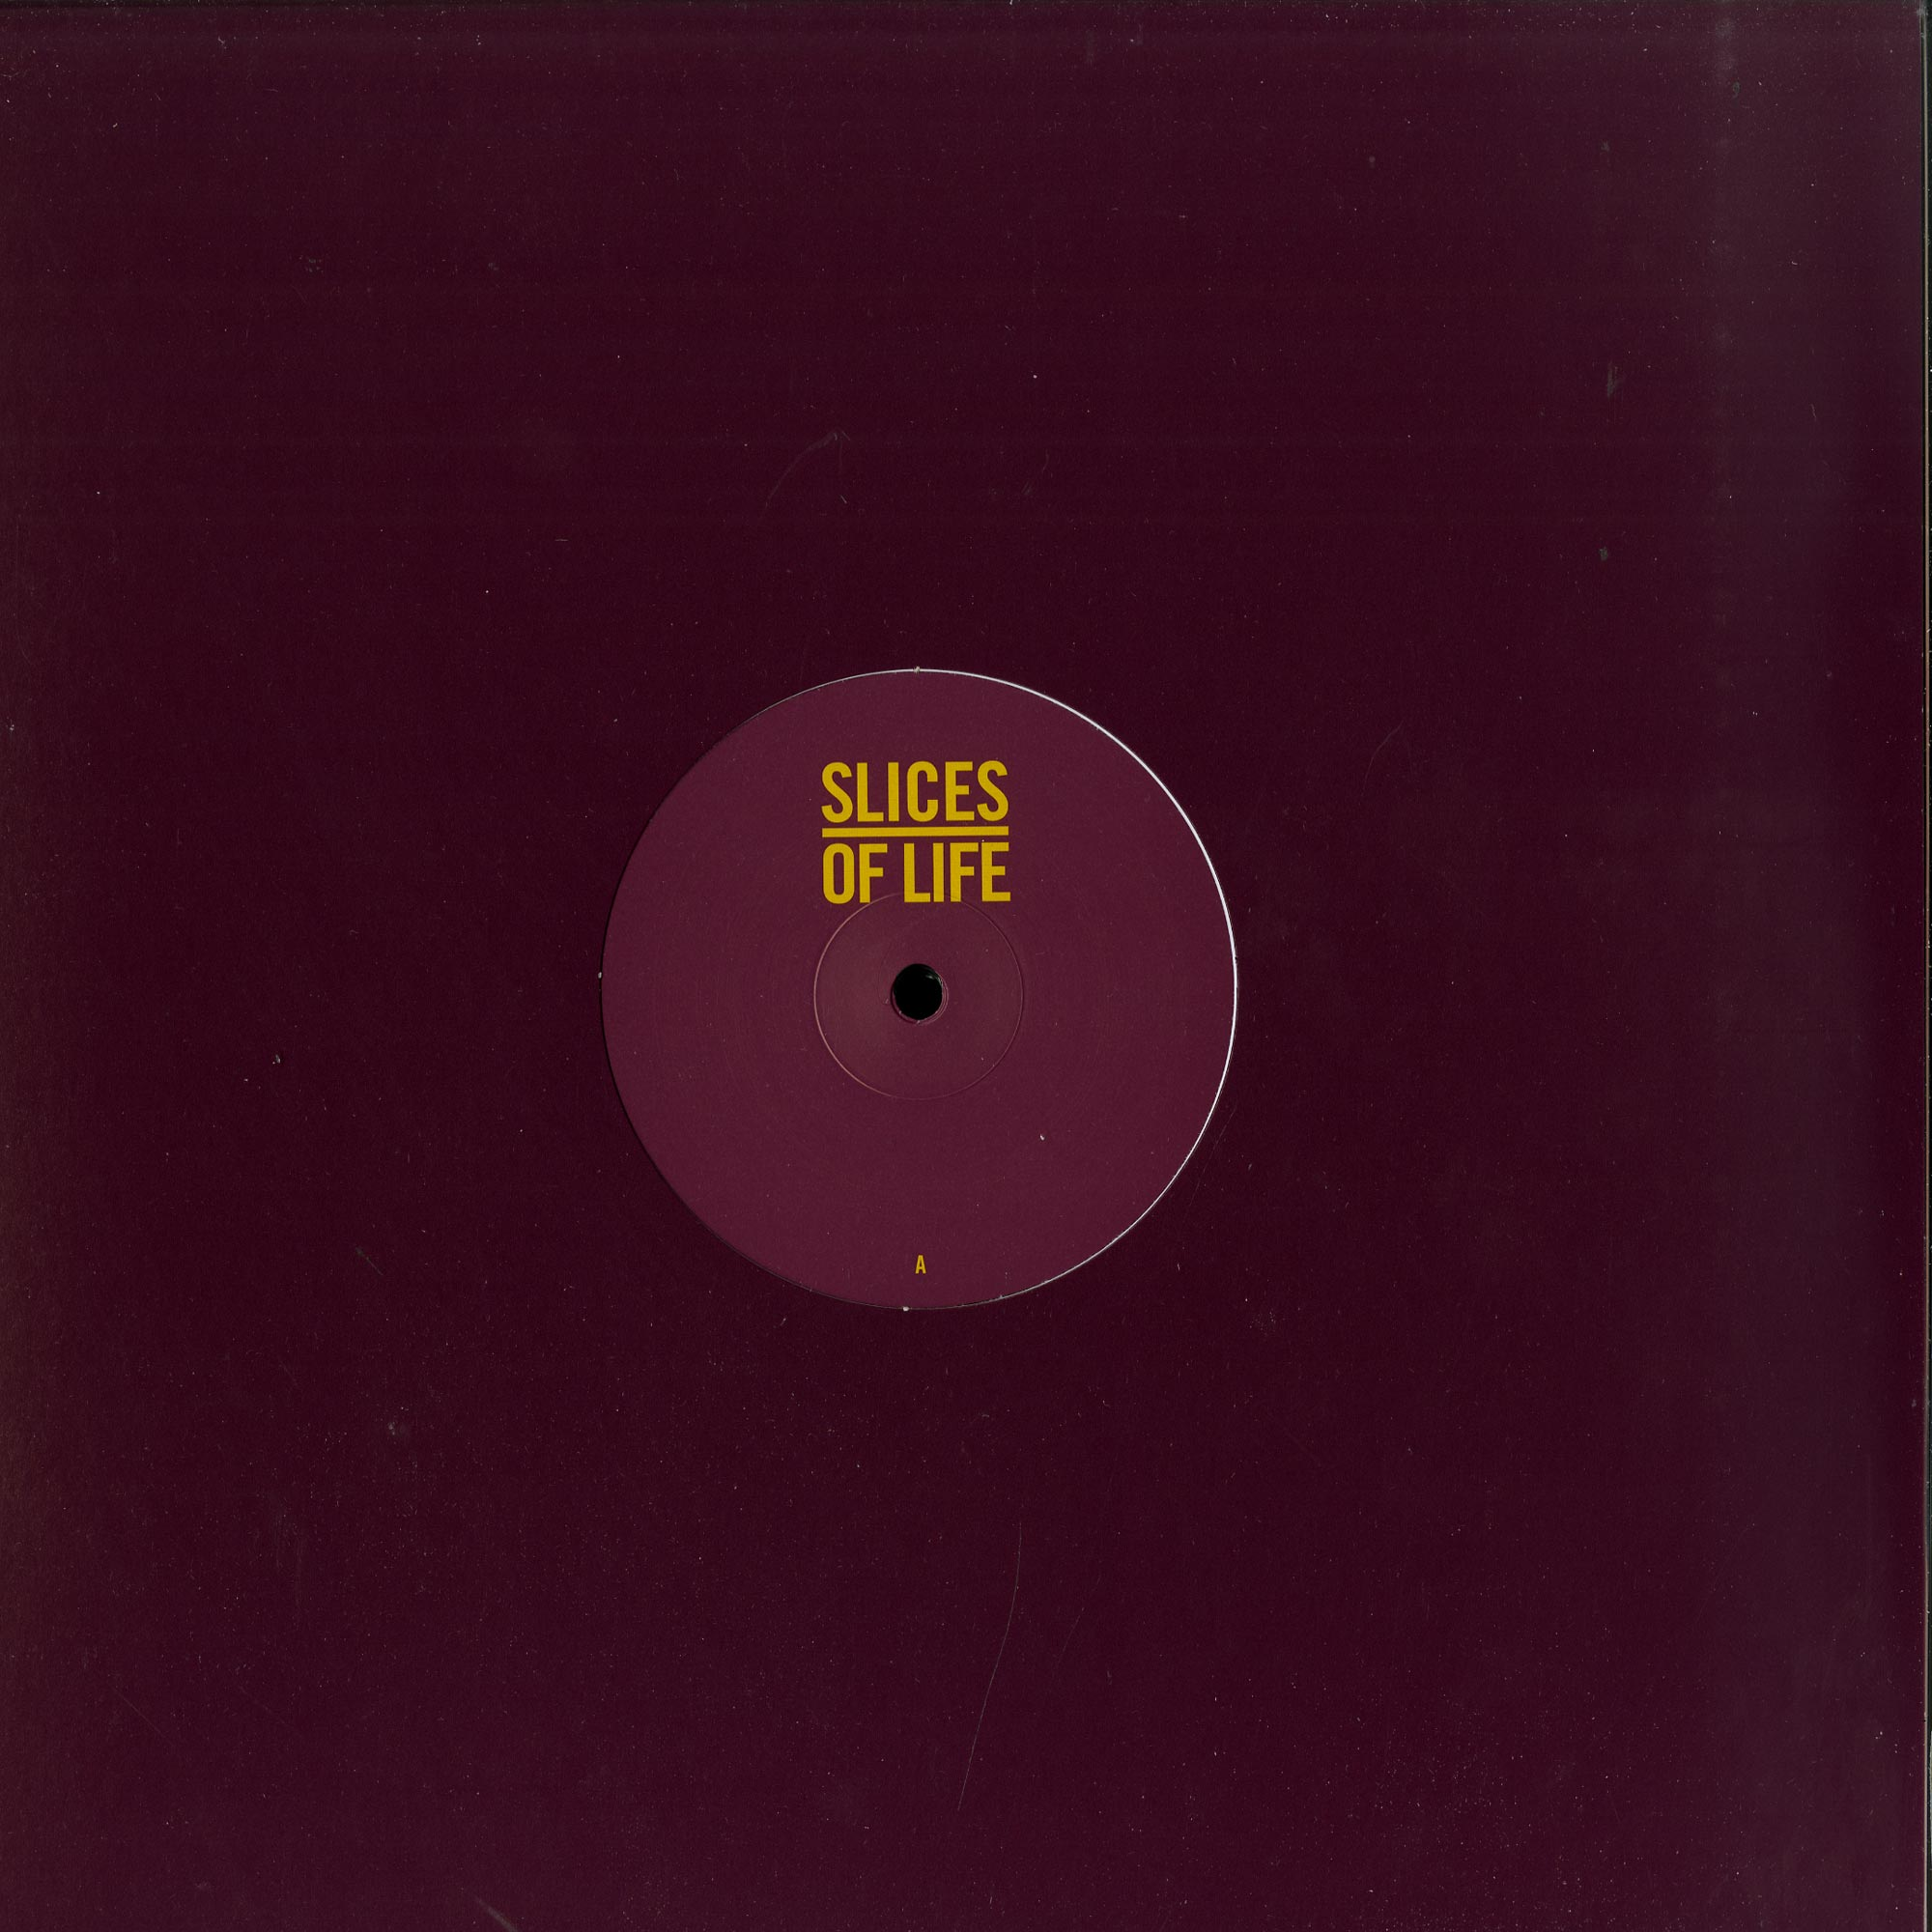 Cab Drivers / Oscar Schubaq / DJ Deep - SLICES OF LIFE 10.2